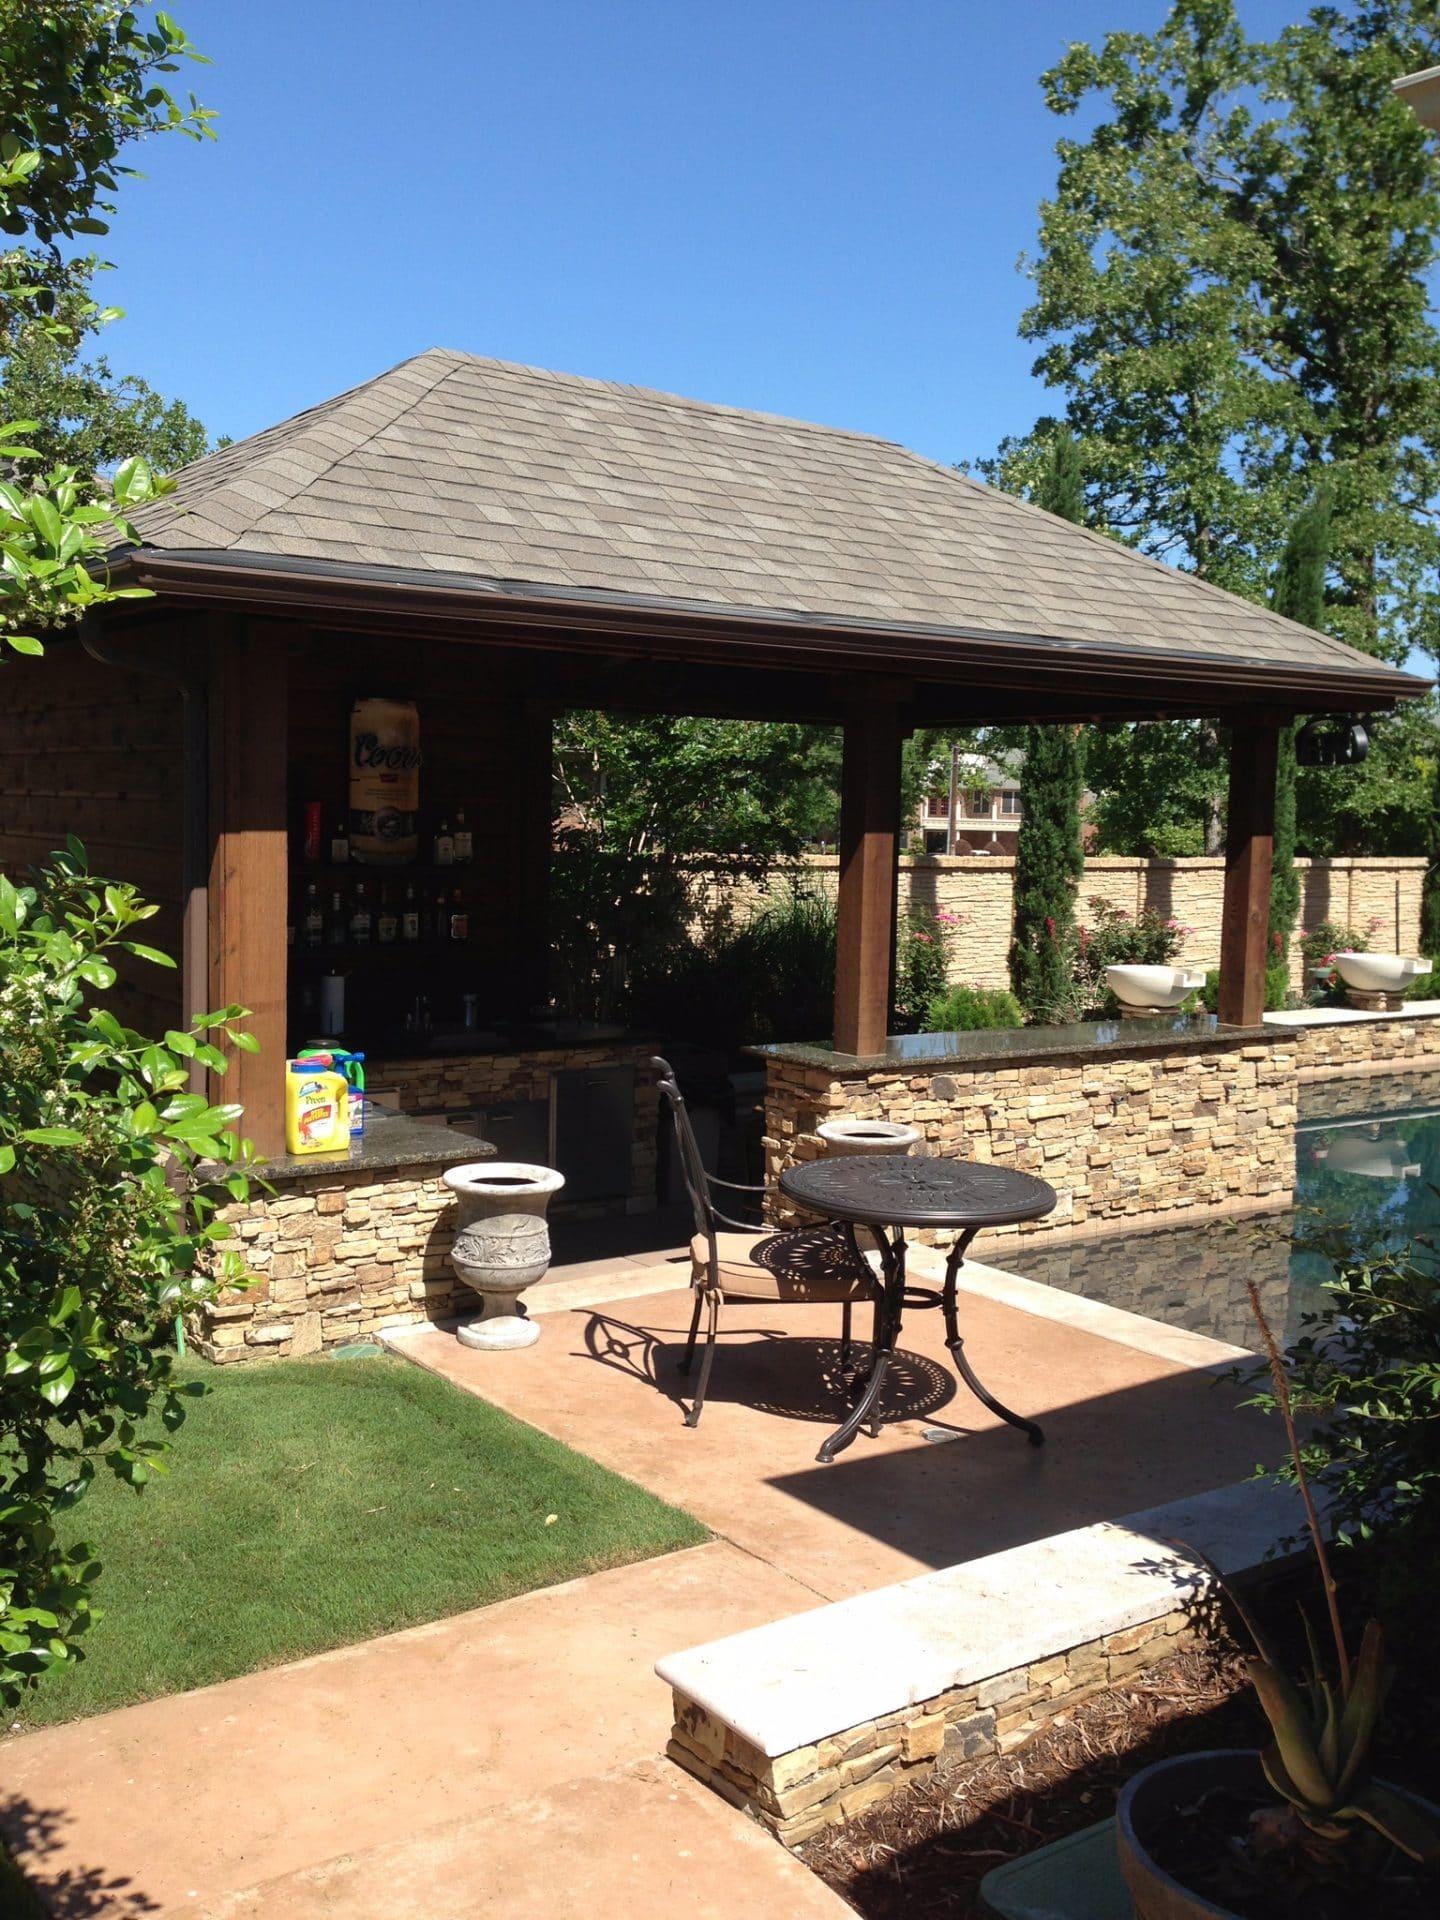 Outdoor Kitchen | Platinum Fence & Patio | Outdoor Living on Platinum Outdoor Living id=73429